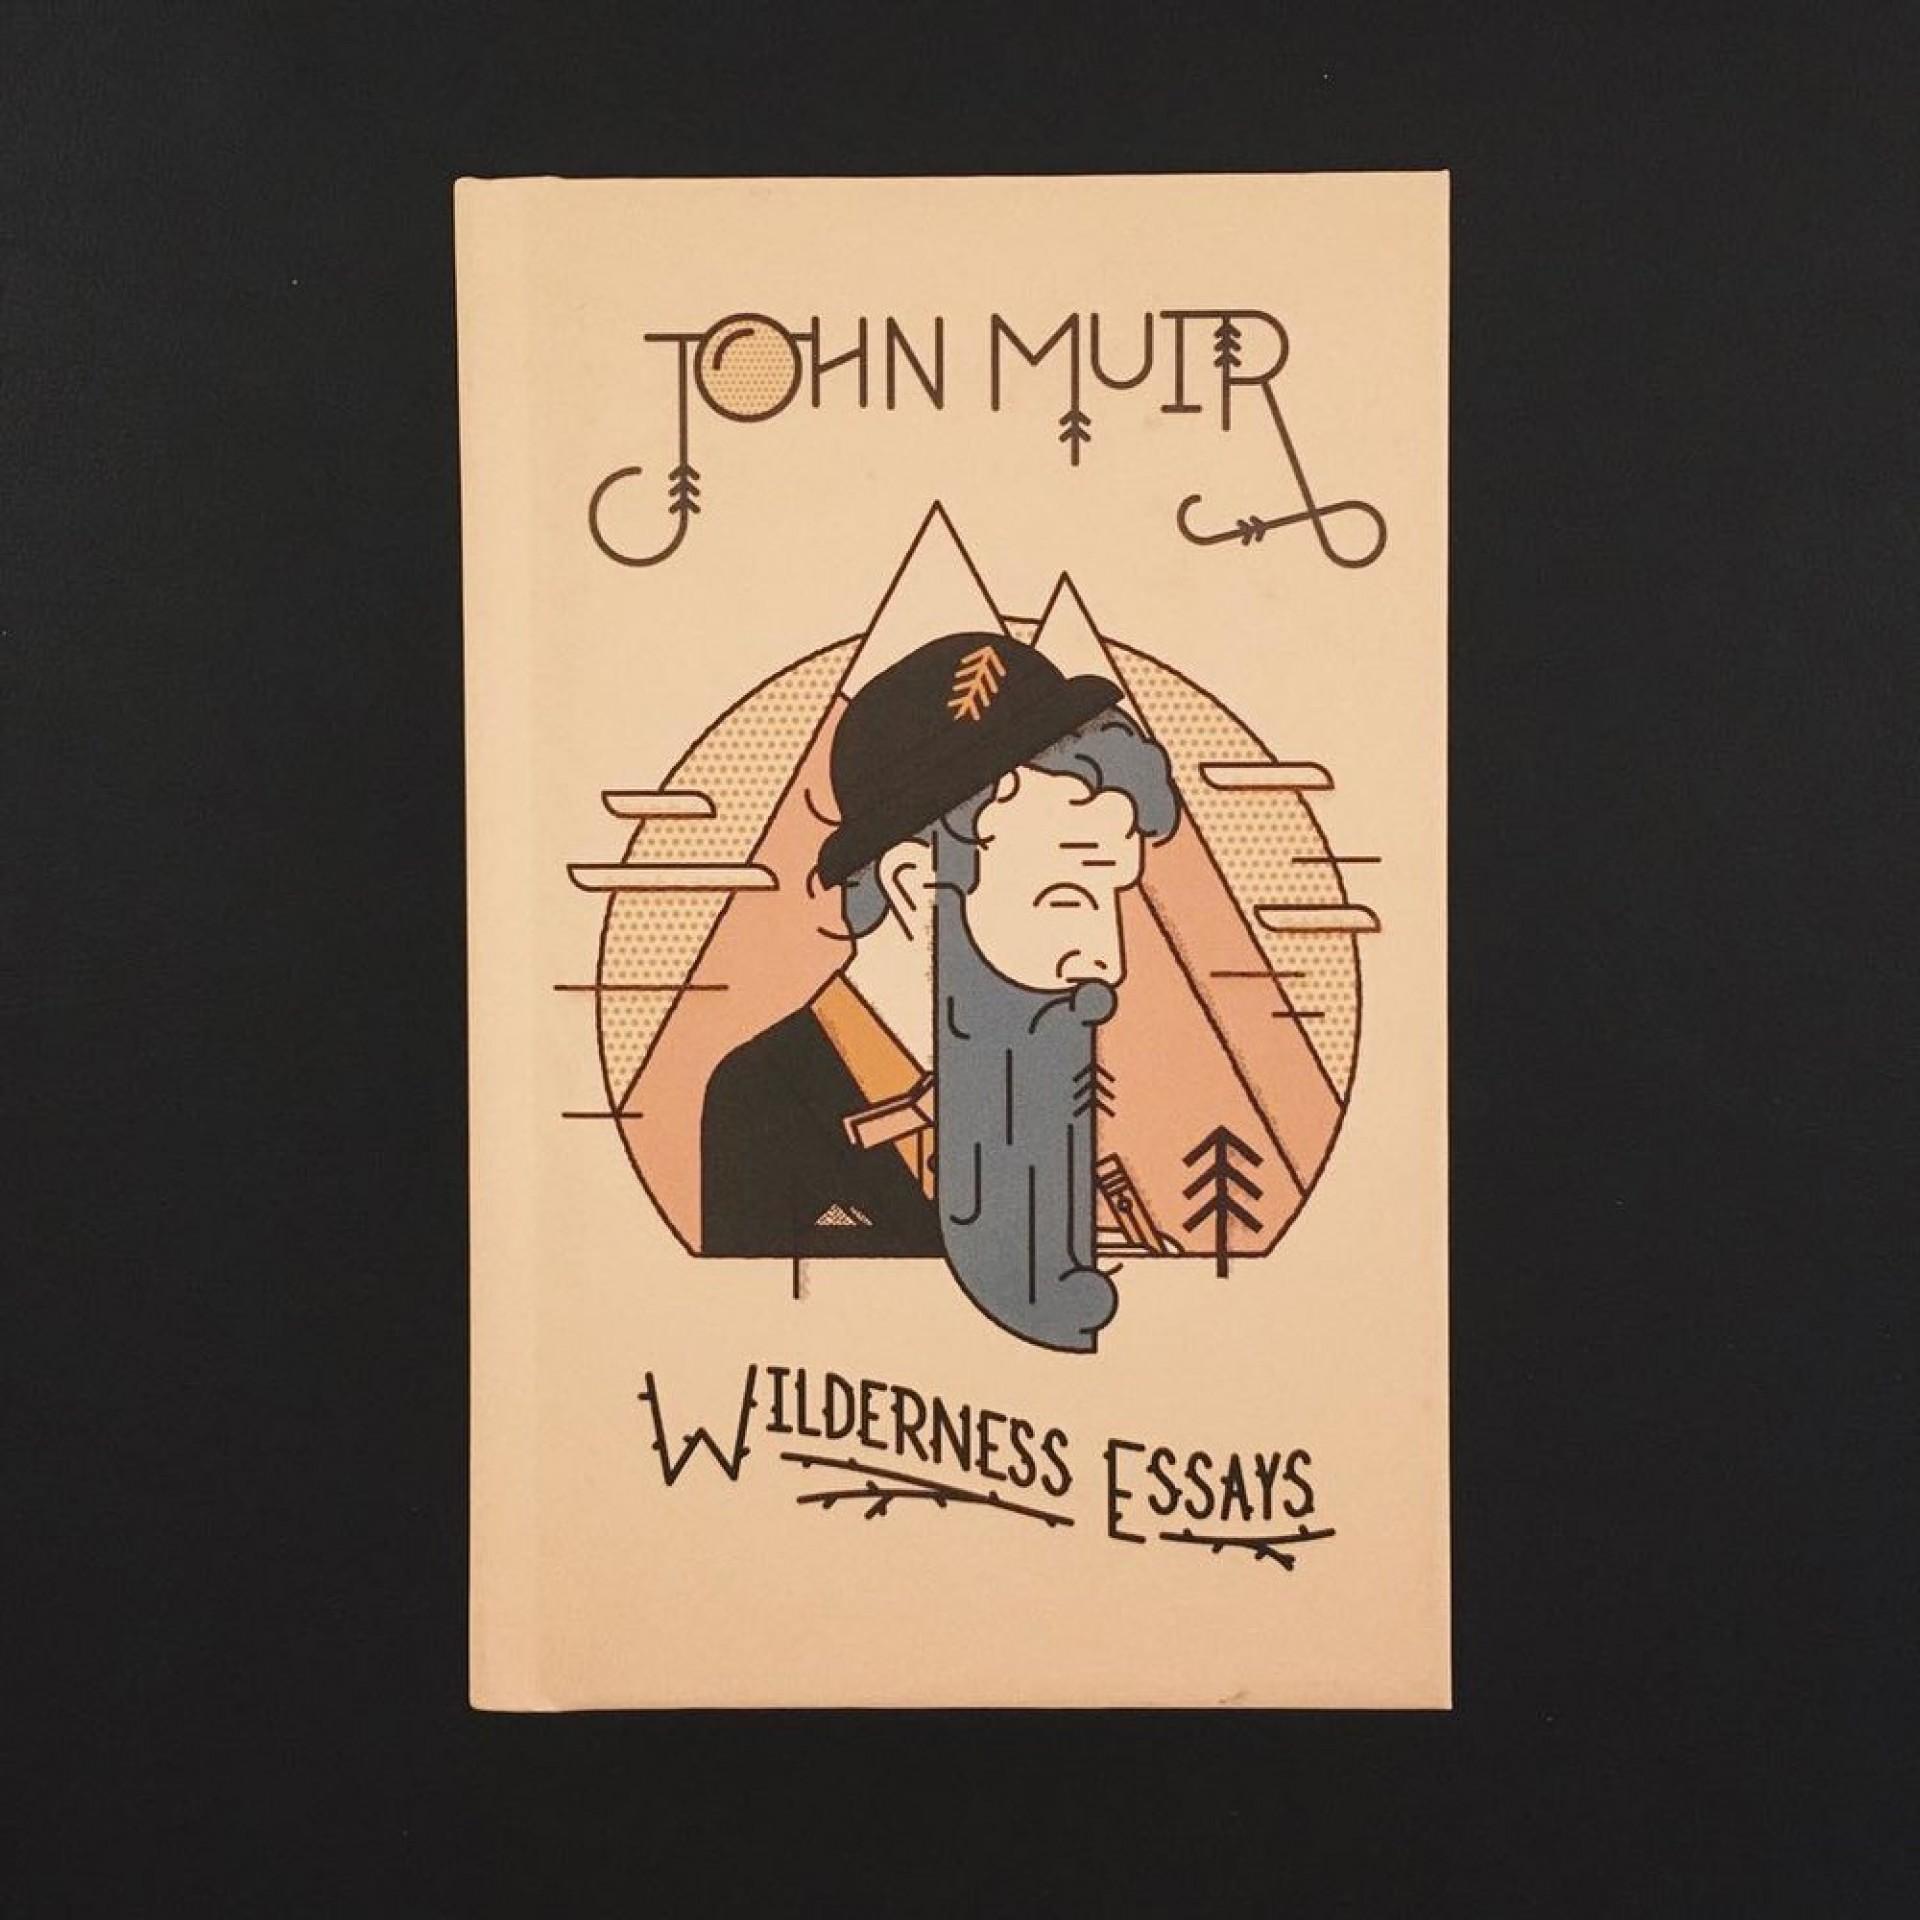 007 9k3d Essay Example John Muir Wilderness Best Essays Pdf Review 1920